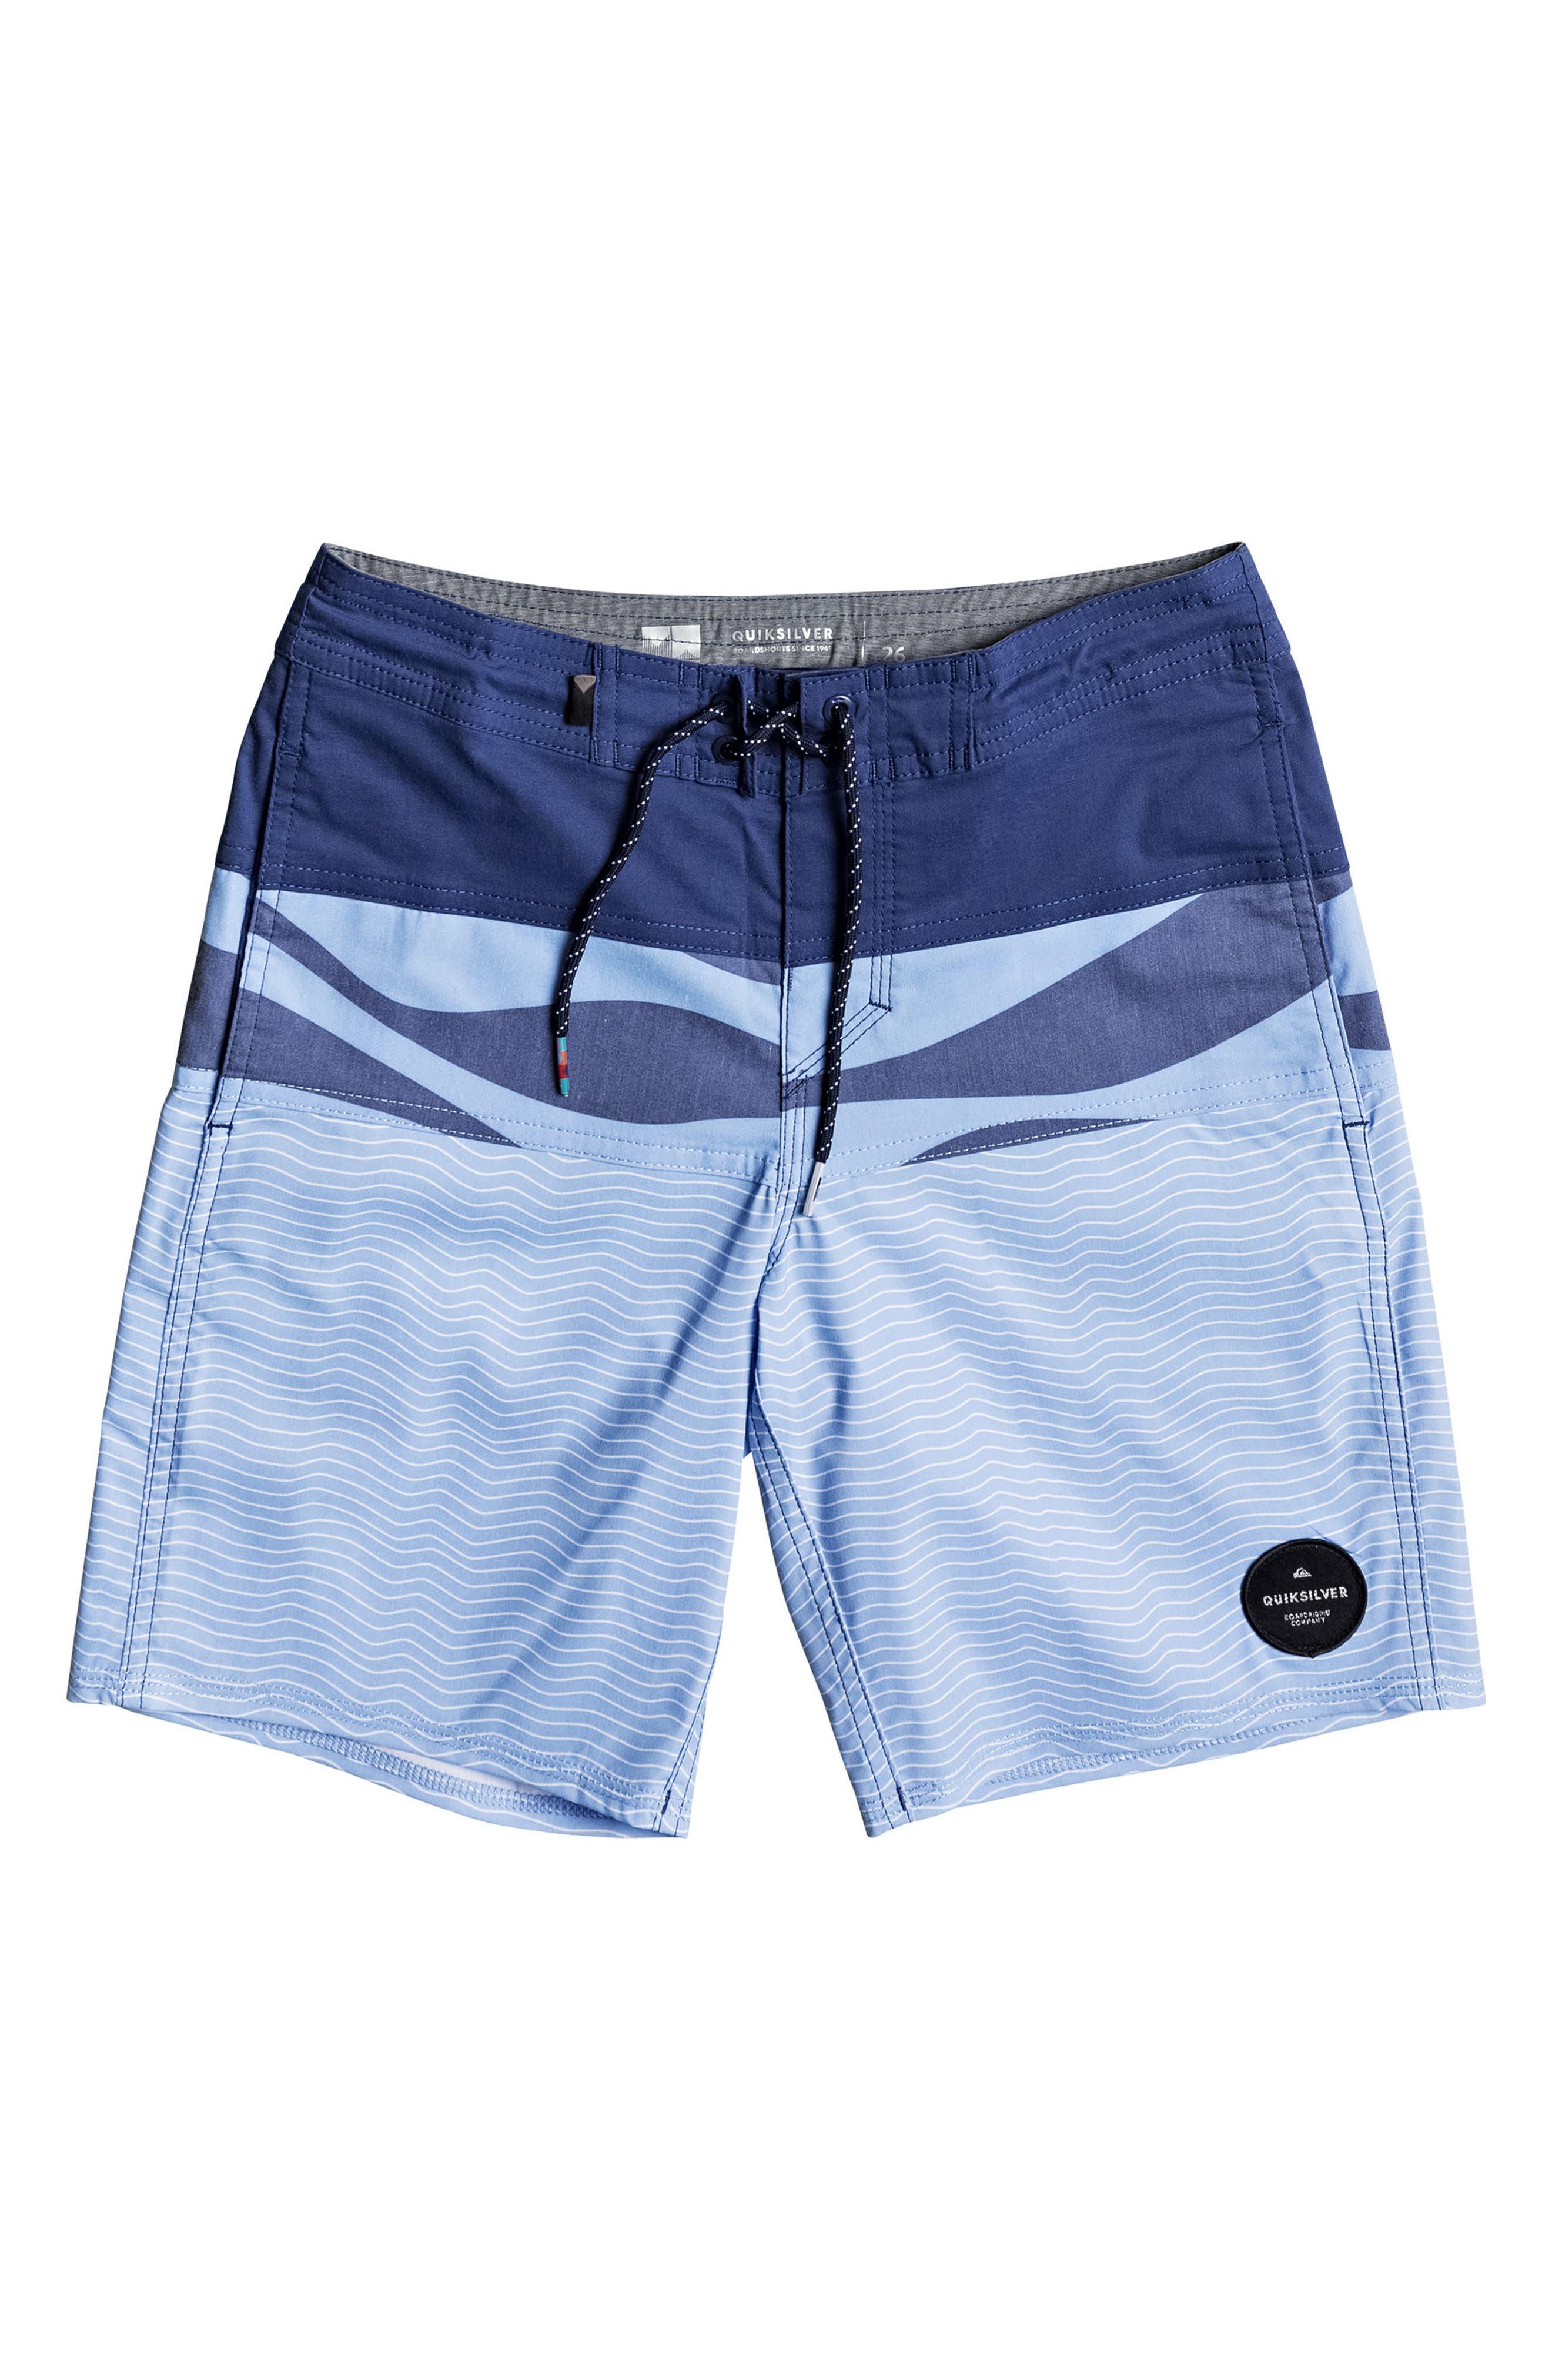 Heatwave Blocked Beach Shorts,                             Main thumbnail 2, color,